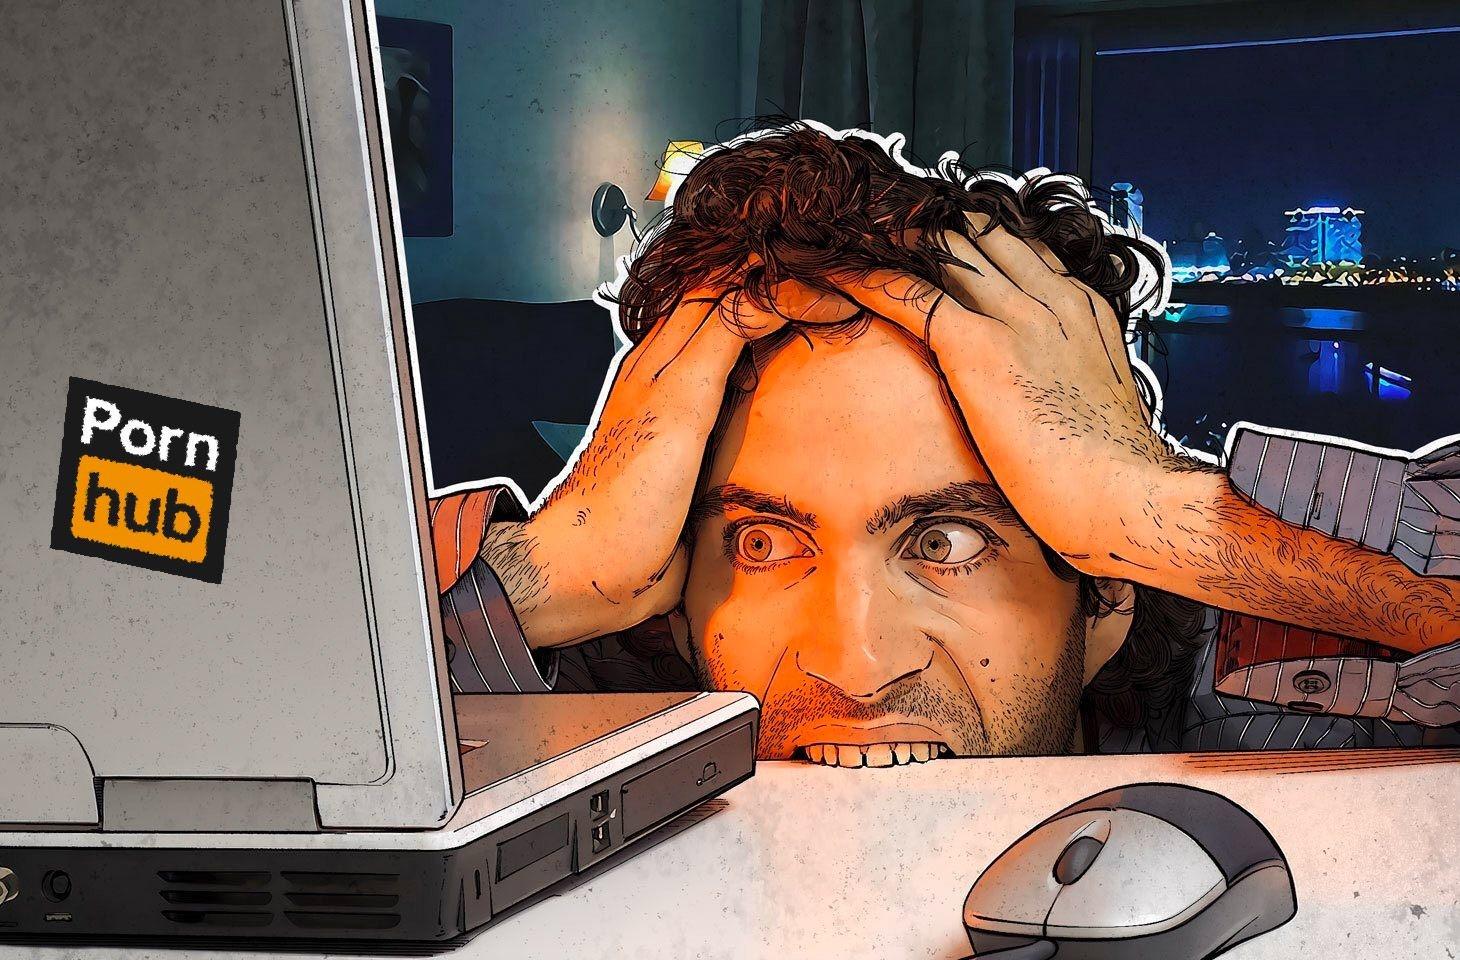 Filipino porn watchers, beware! Login-in stealing malware rise 100% in 2018